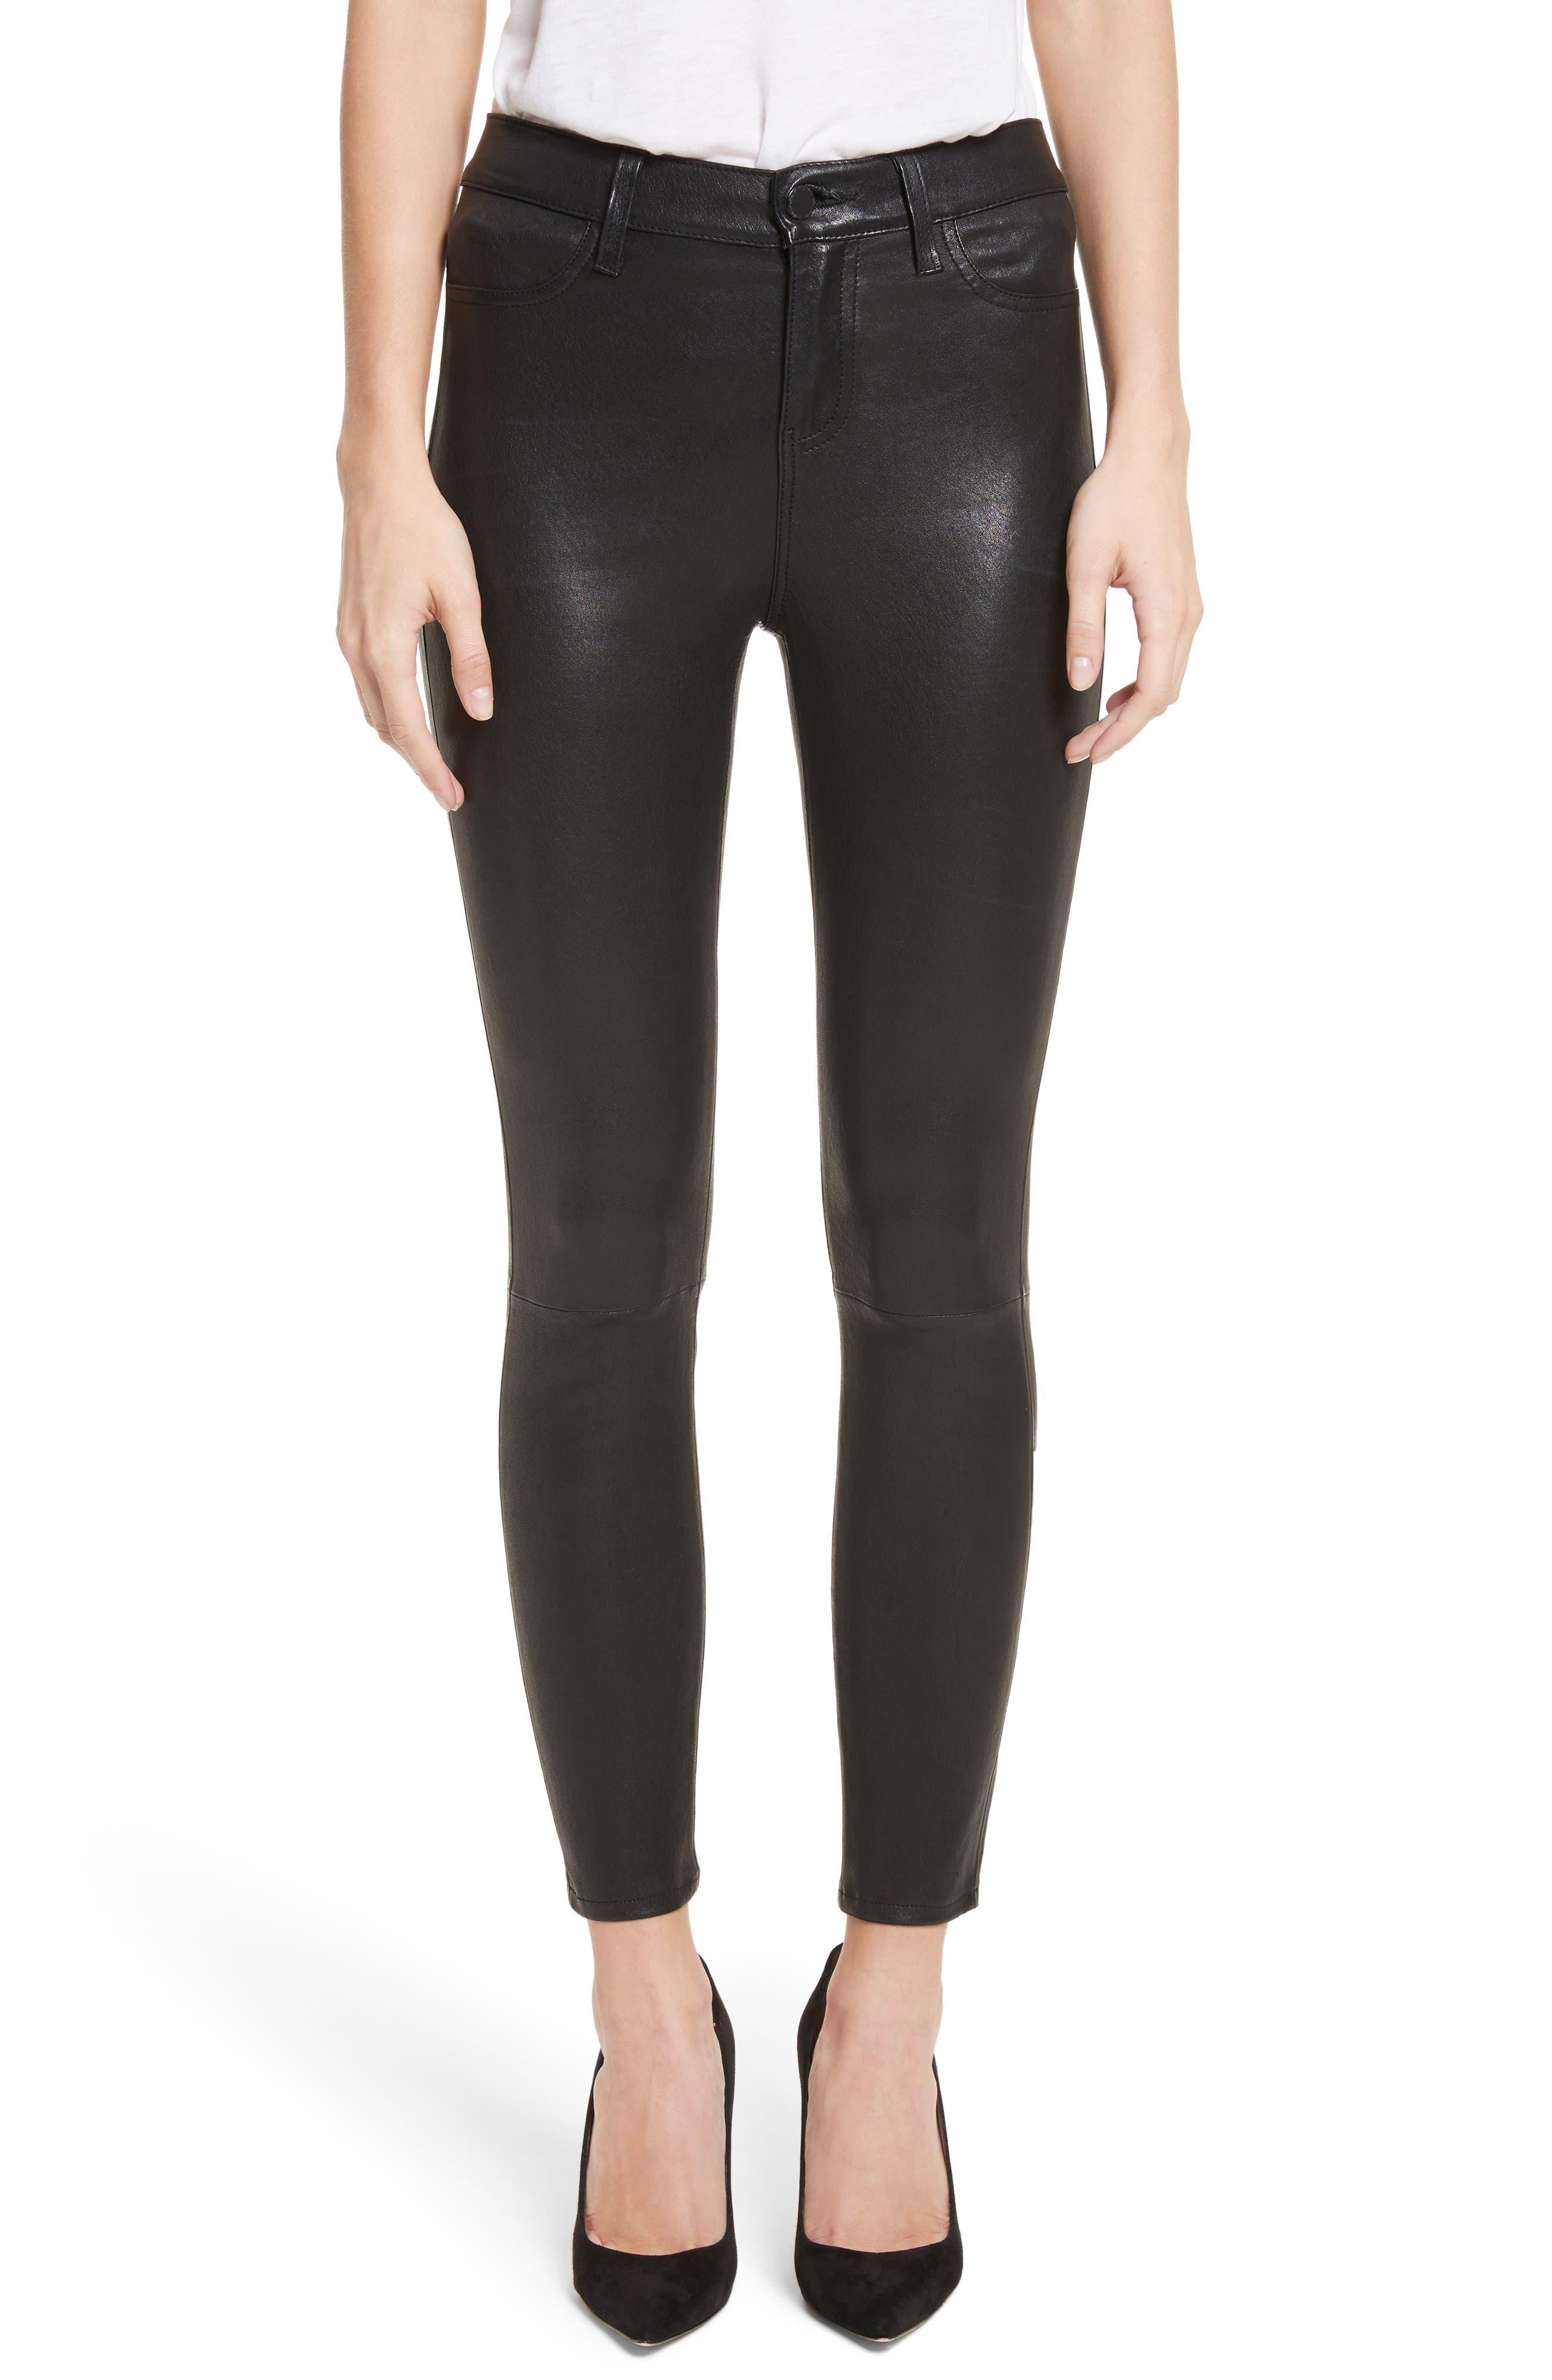 LAGENCE Adelaide High Waist Crop Leather Jeans,                         Main,                         color, Noir